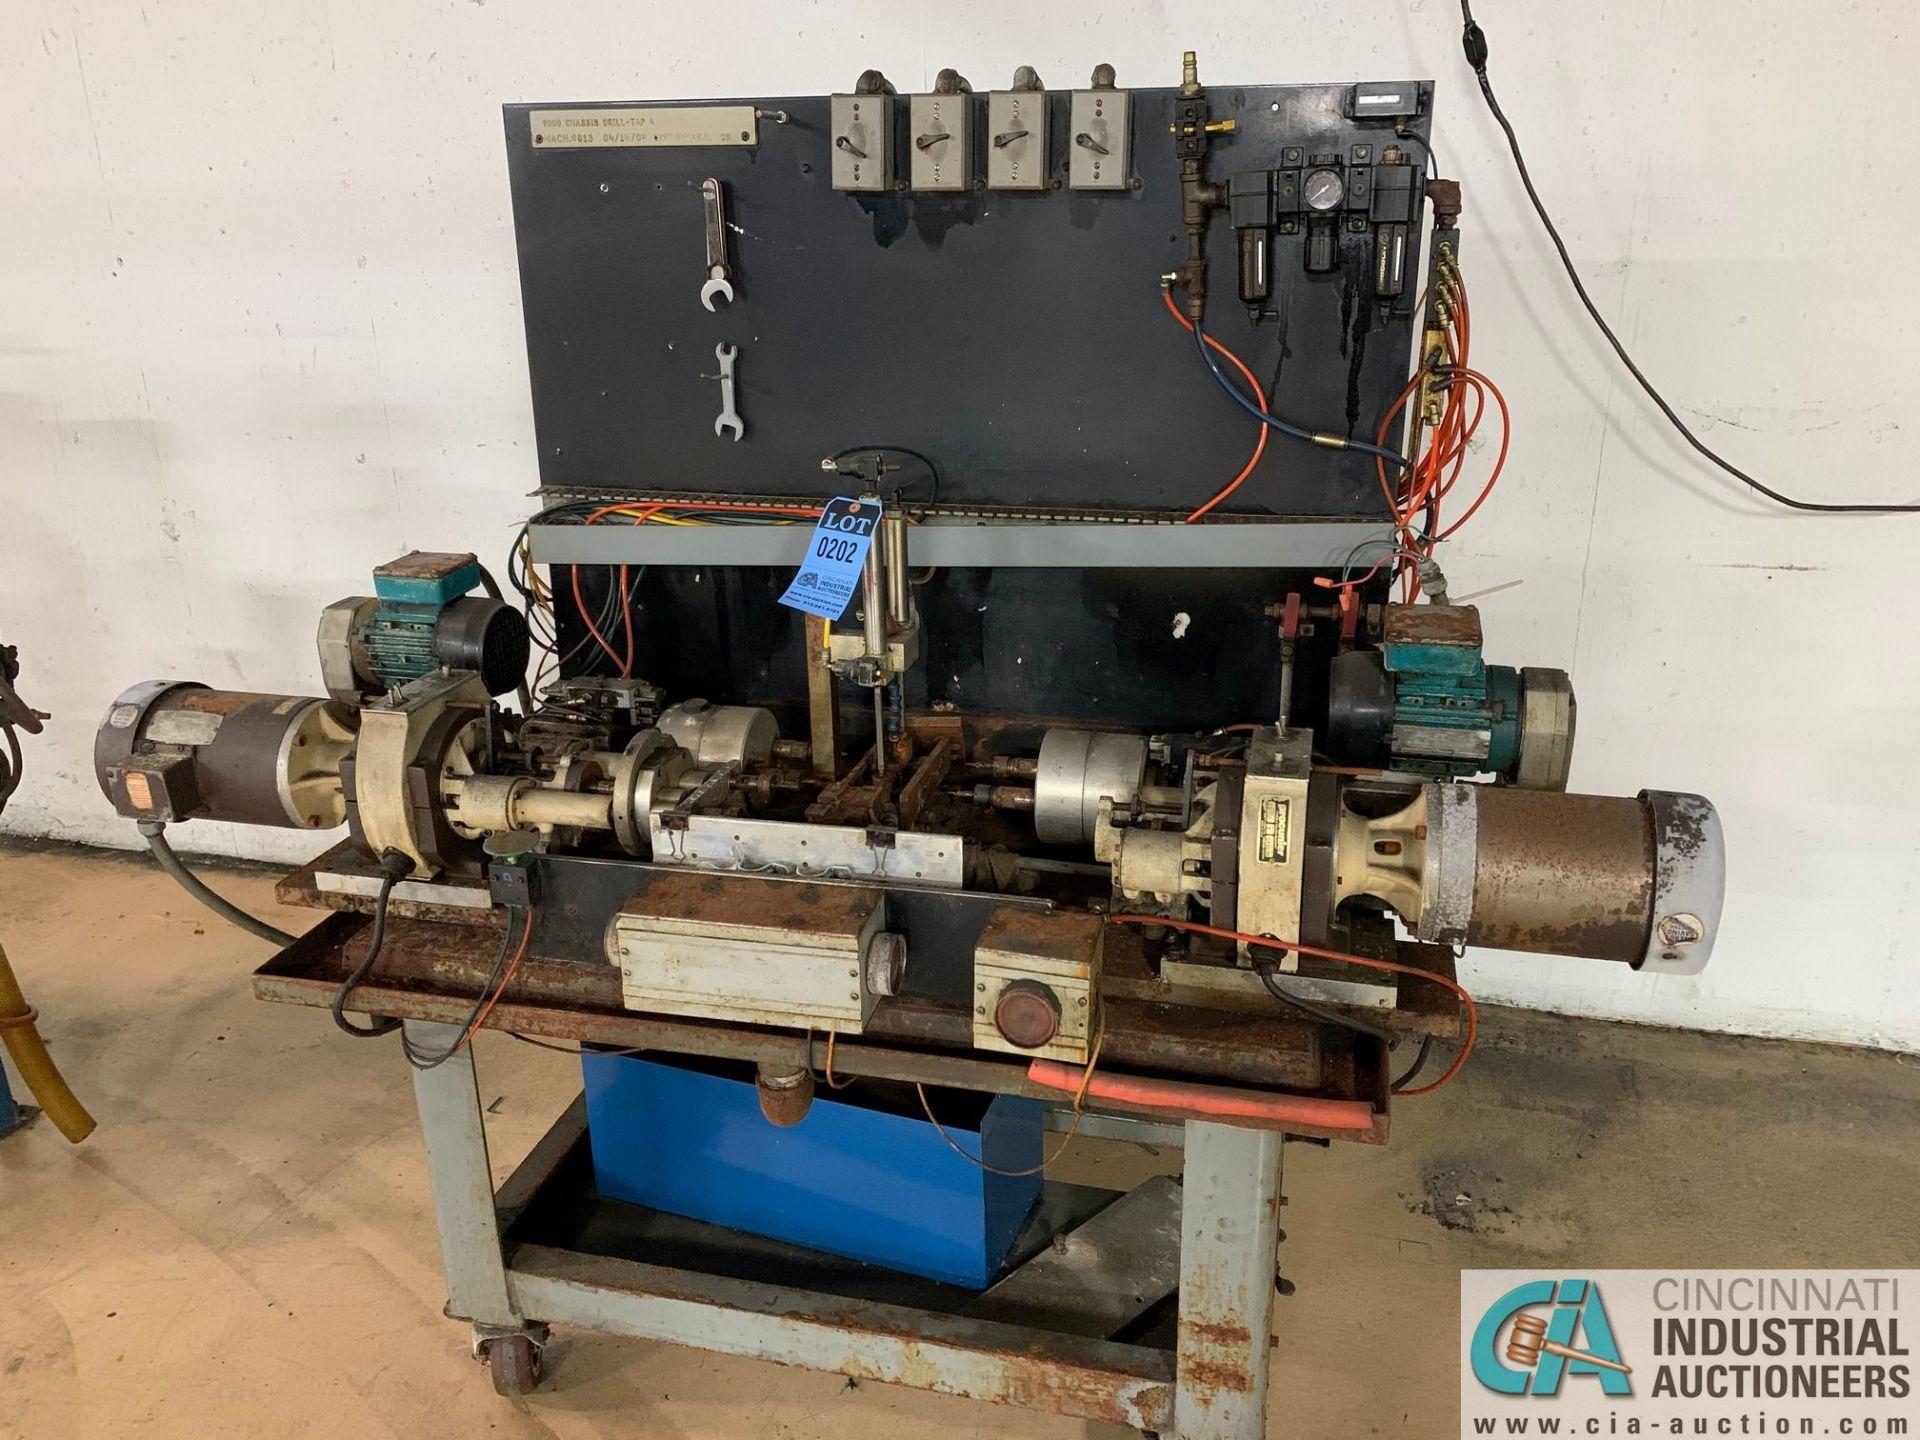 8-SPINDLE HORIZONTAL DRILLING MACHINE